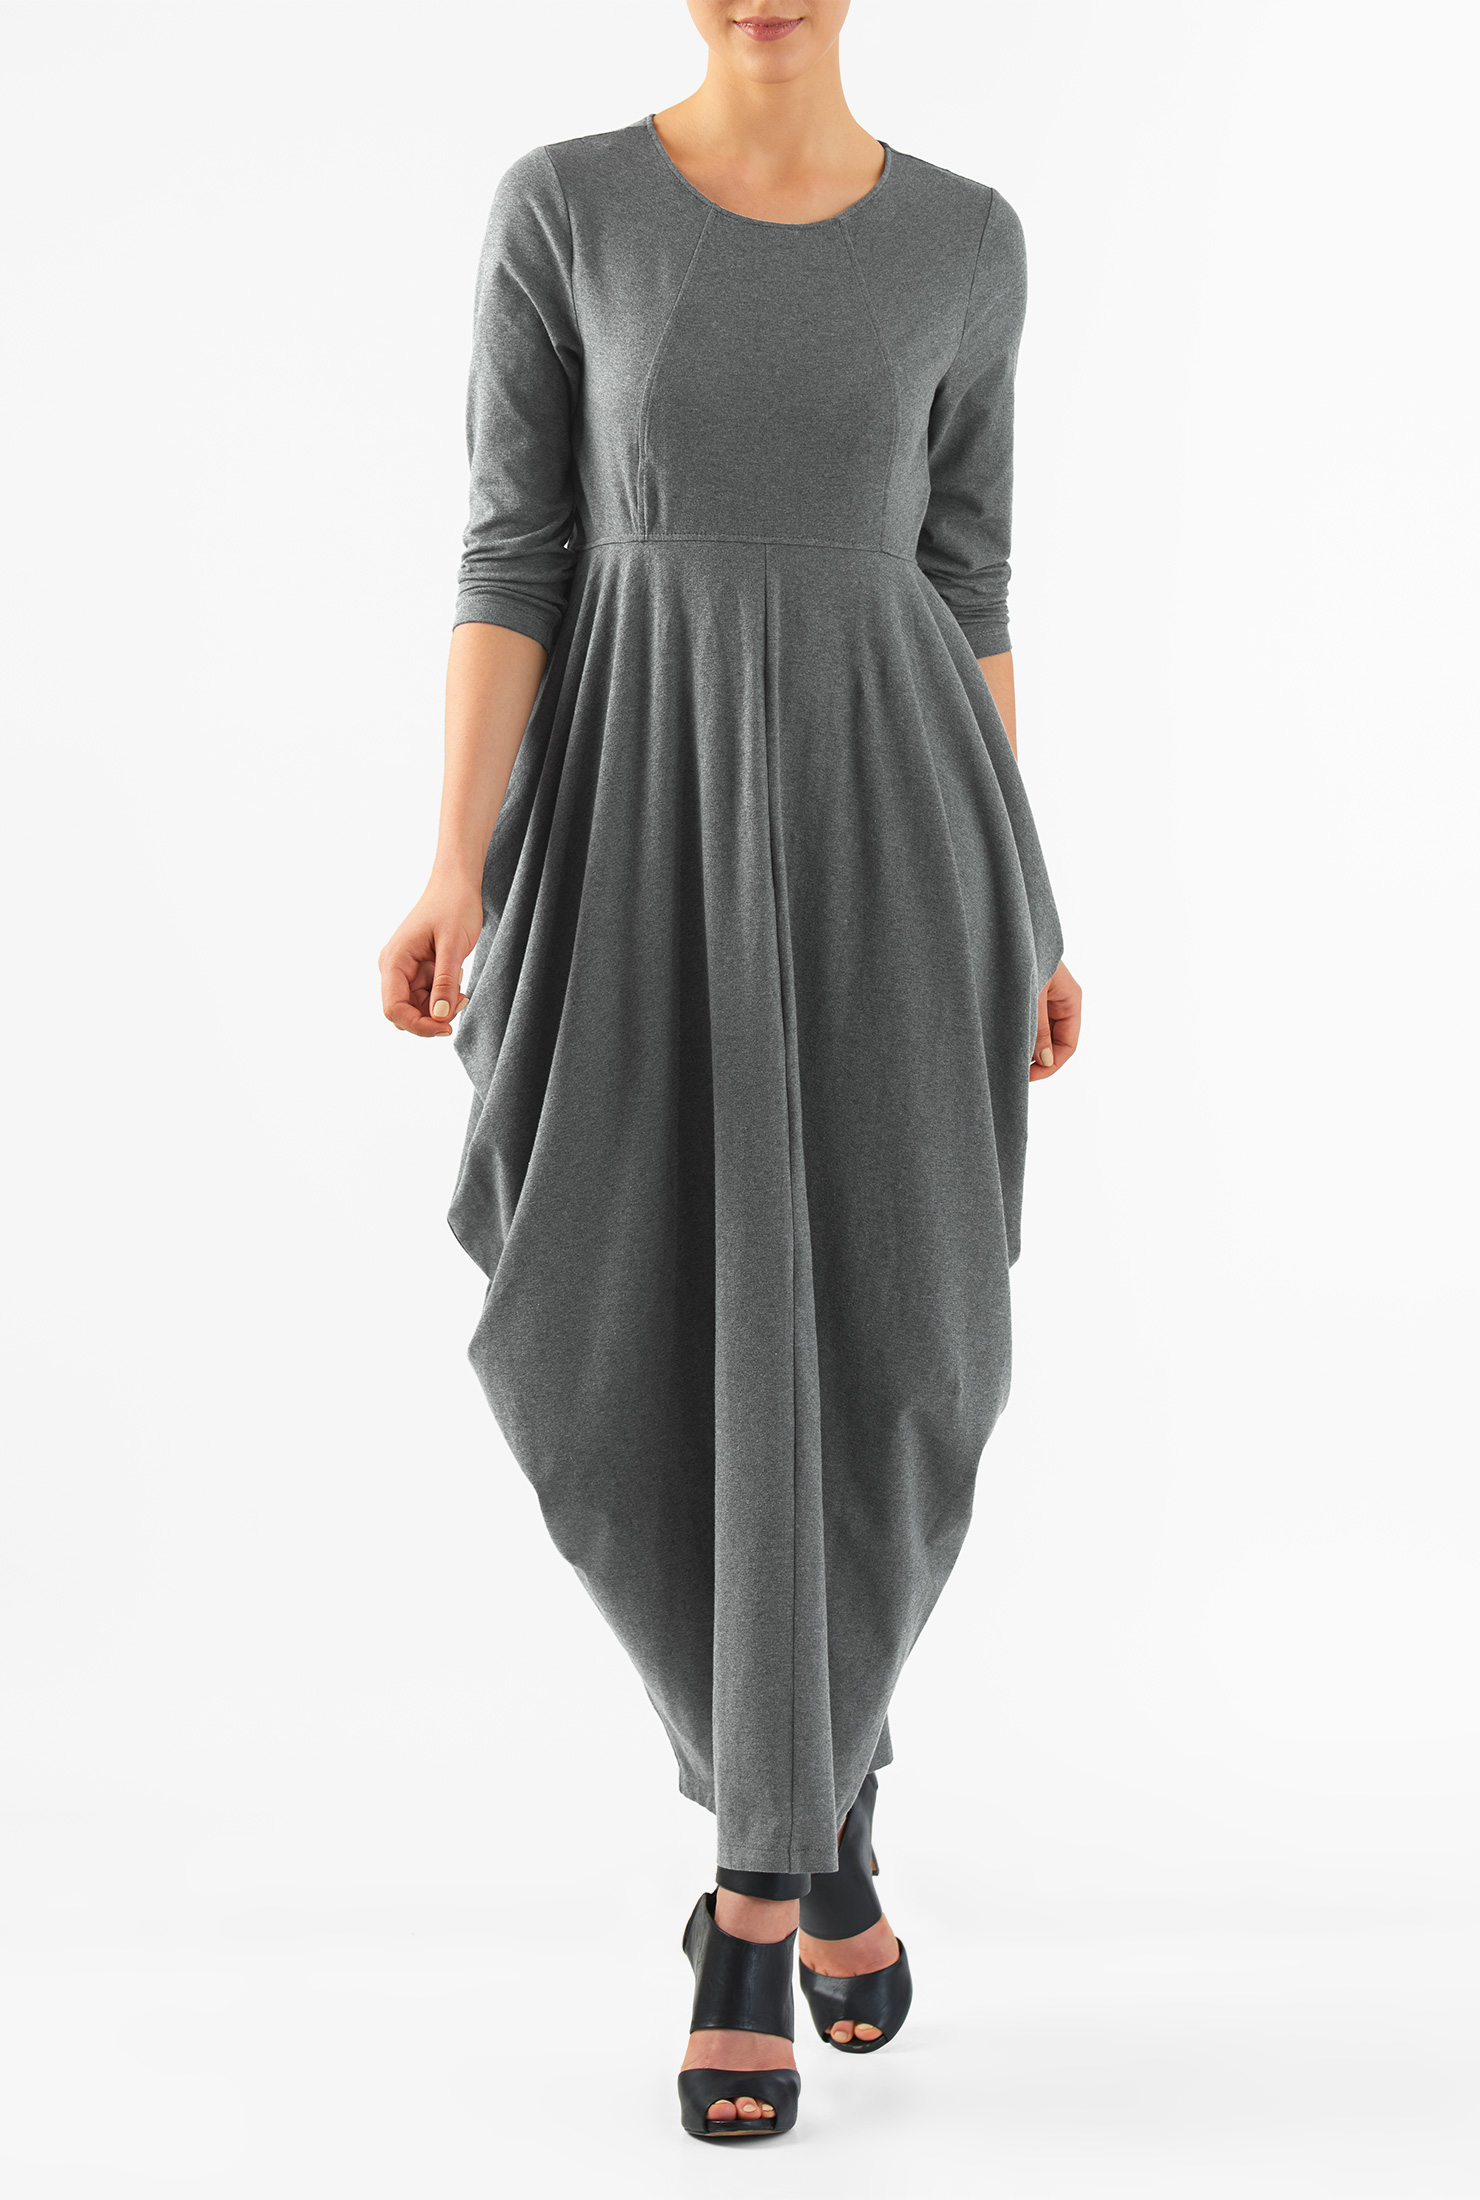 Eshakti Womens Draped Flounce Cotton Knit Maxi Dress